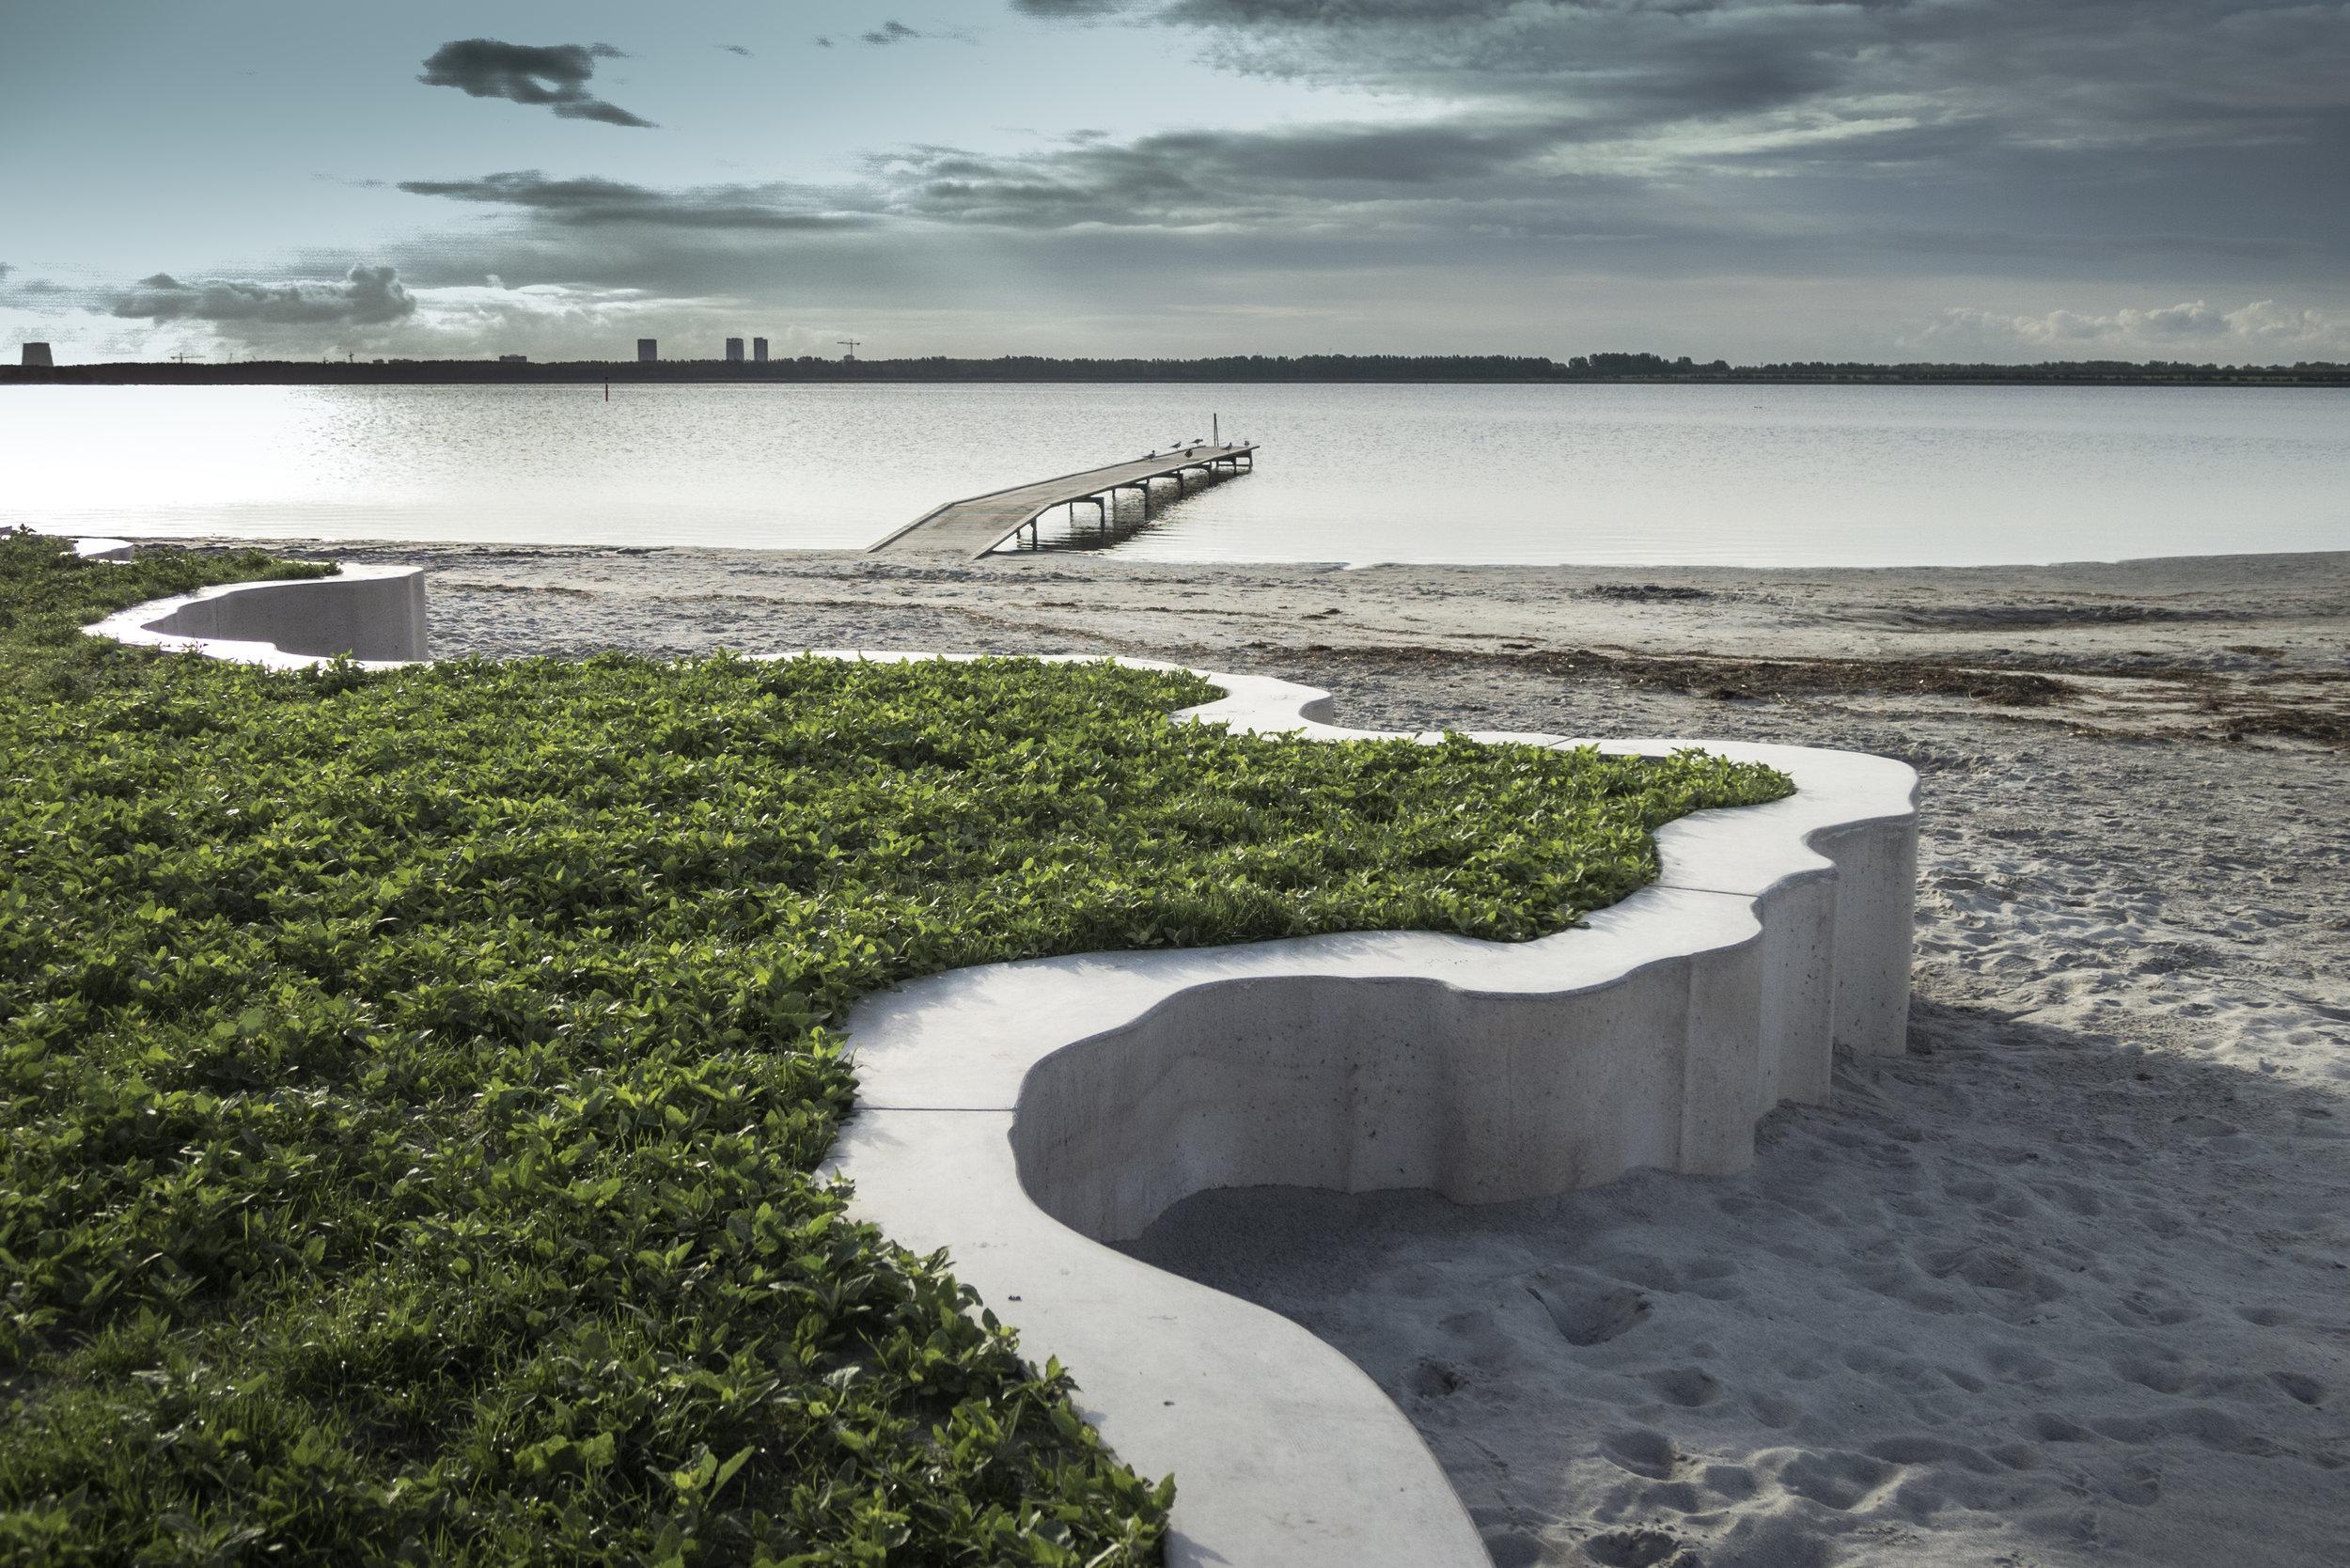 The metropolitan beach is widely used.Photo credit - Naja Viscor.